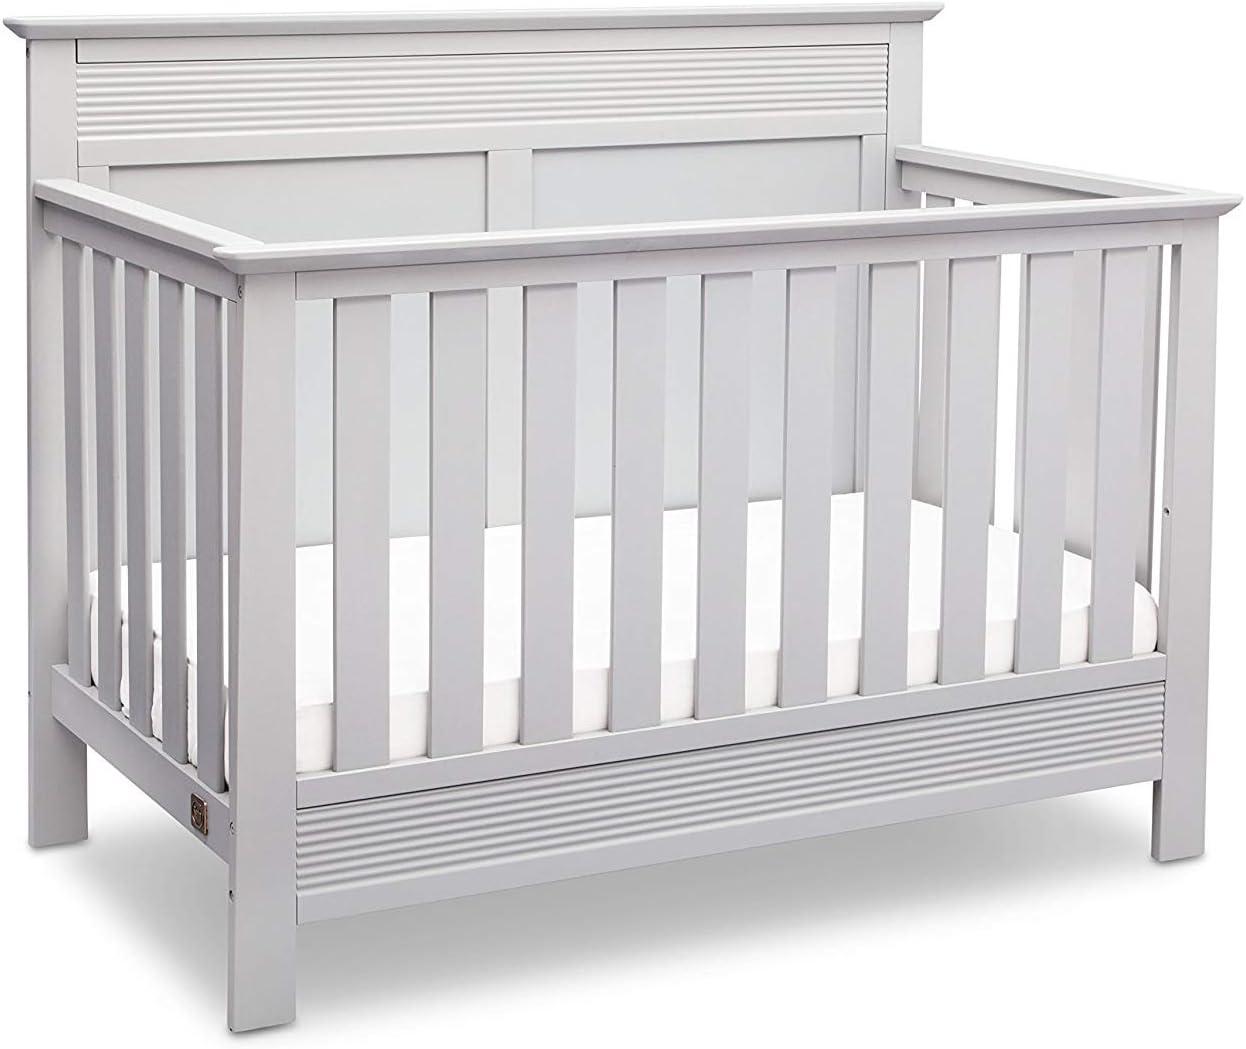 Serta Fall River 5-Piece Nursery Furniture Set Serta Convertible Crib, 4-Drawer Dresser, Changing Top, Serta Crib Mattress, Glider White//French Grey